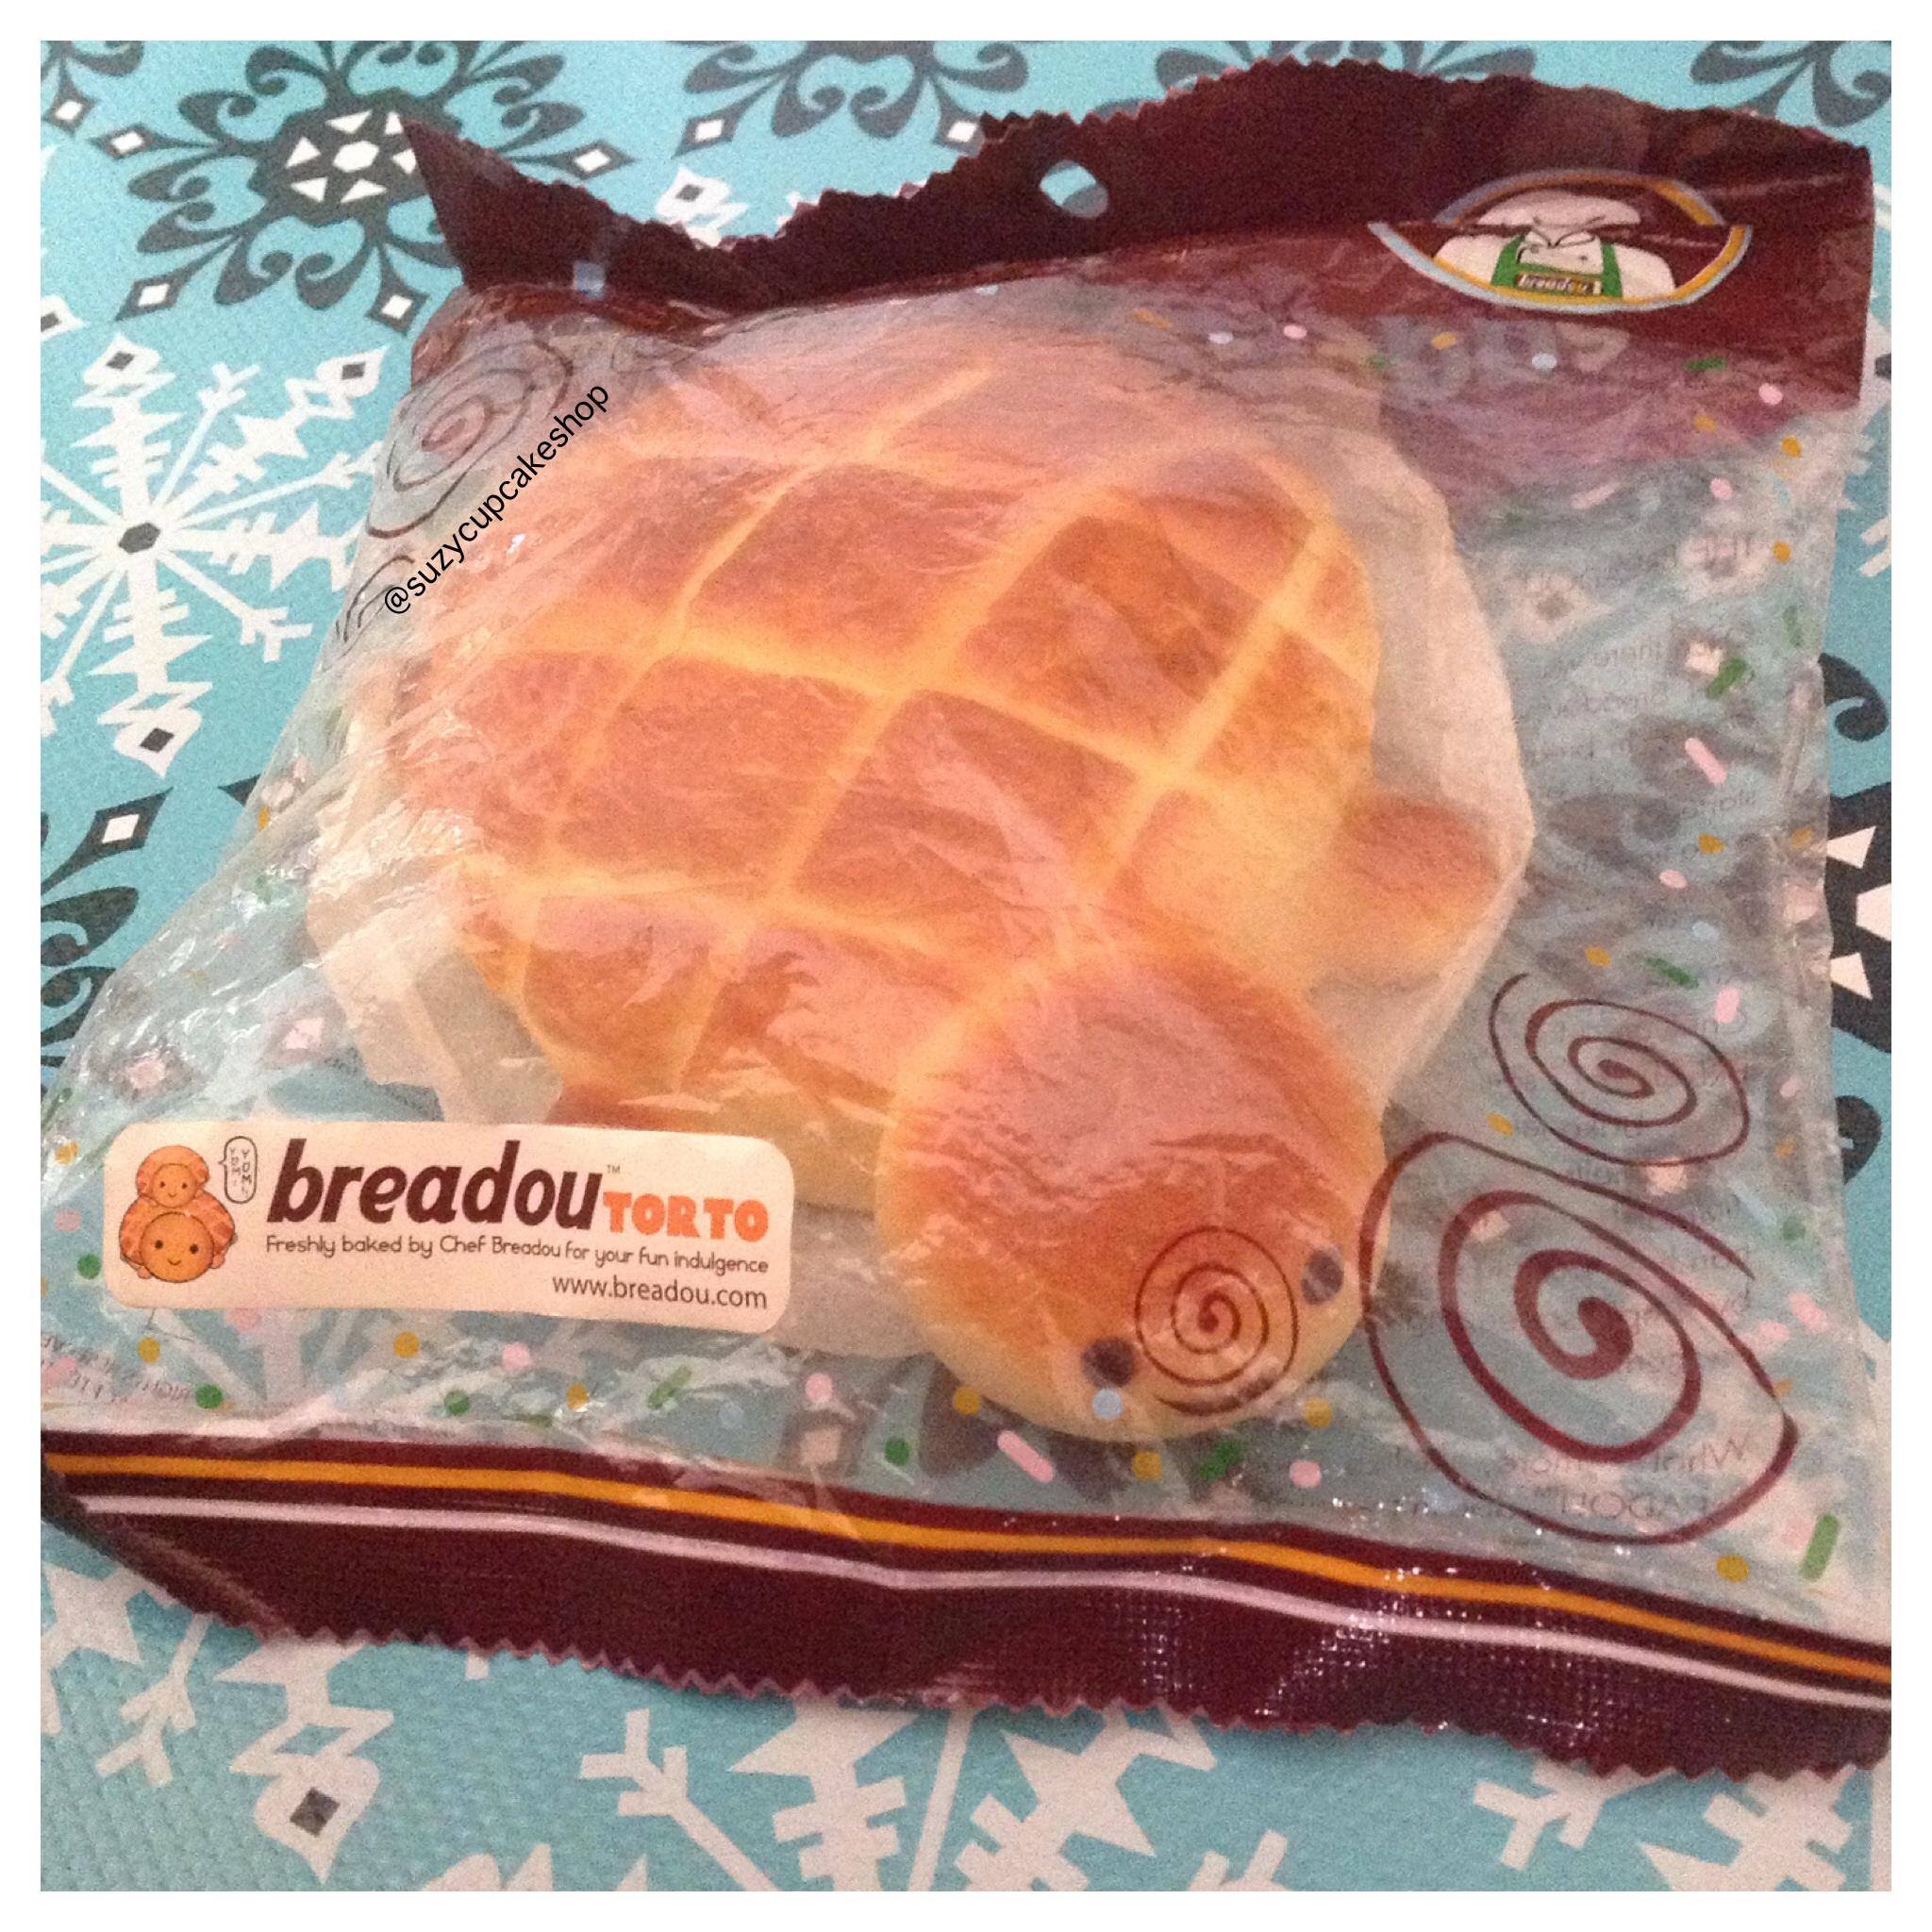 Squishy Breadou Torto : Super rare non reproduced ORIGINAL breadou torto squishy ? SuzyCupcake ? Online Store Powered by ...